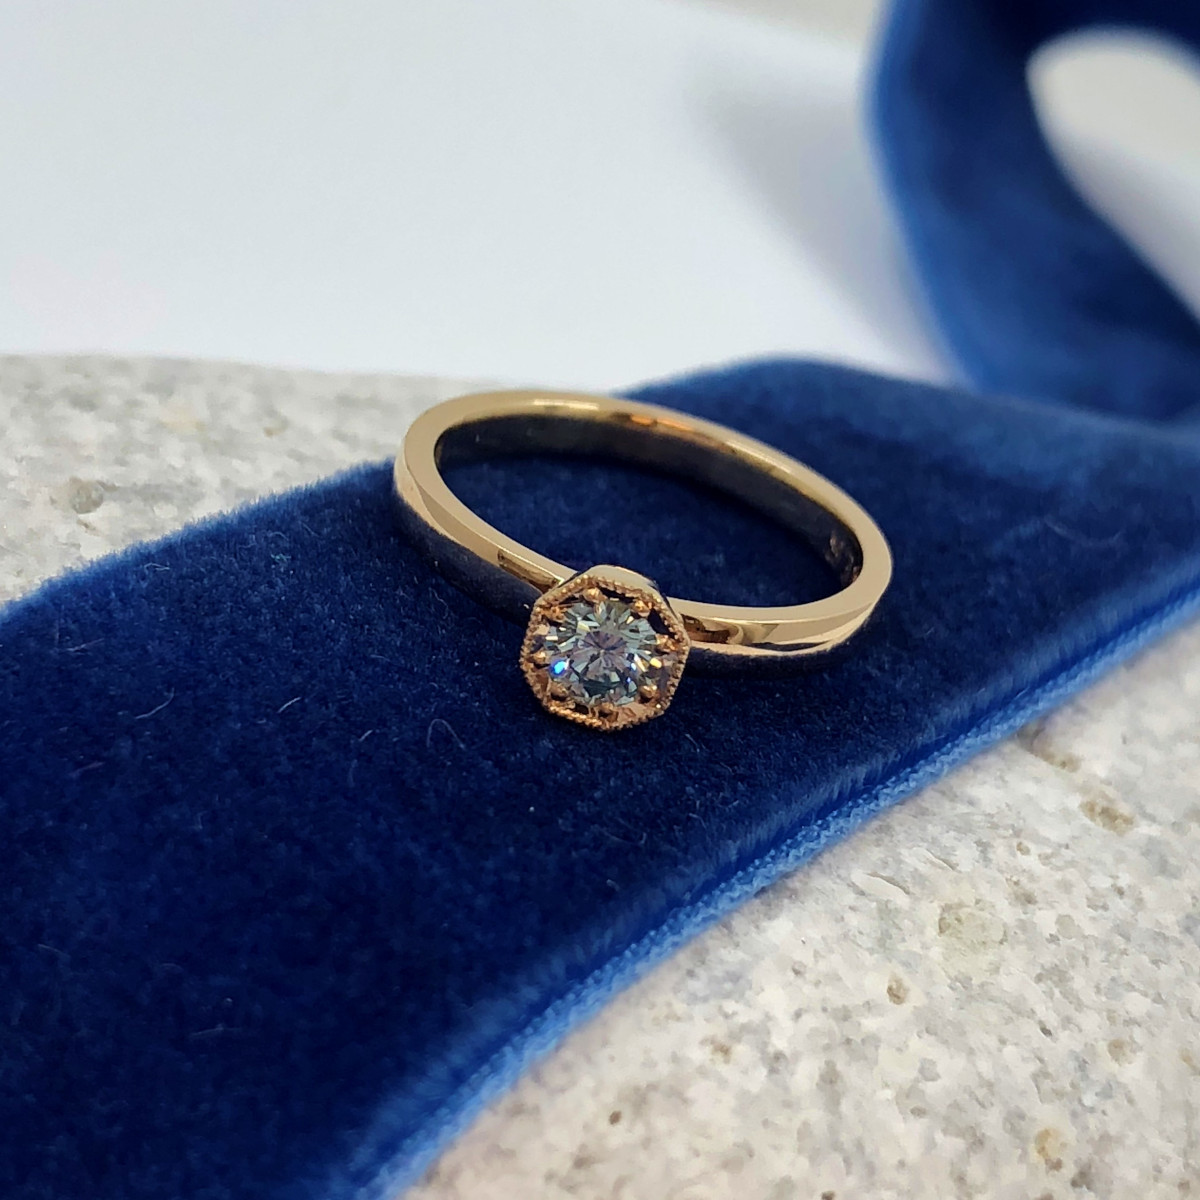 Blåa diamanter, alliansring, vigselring